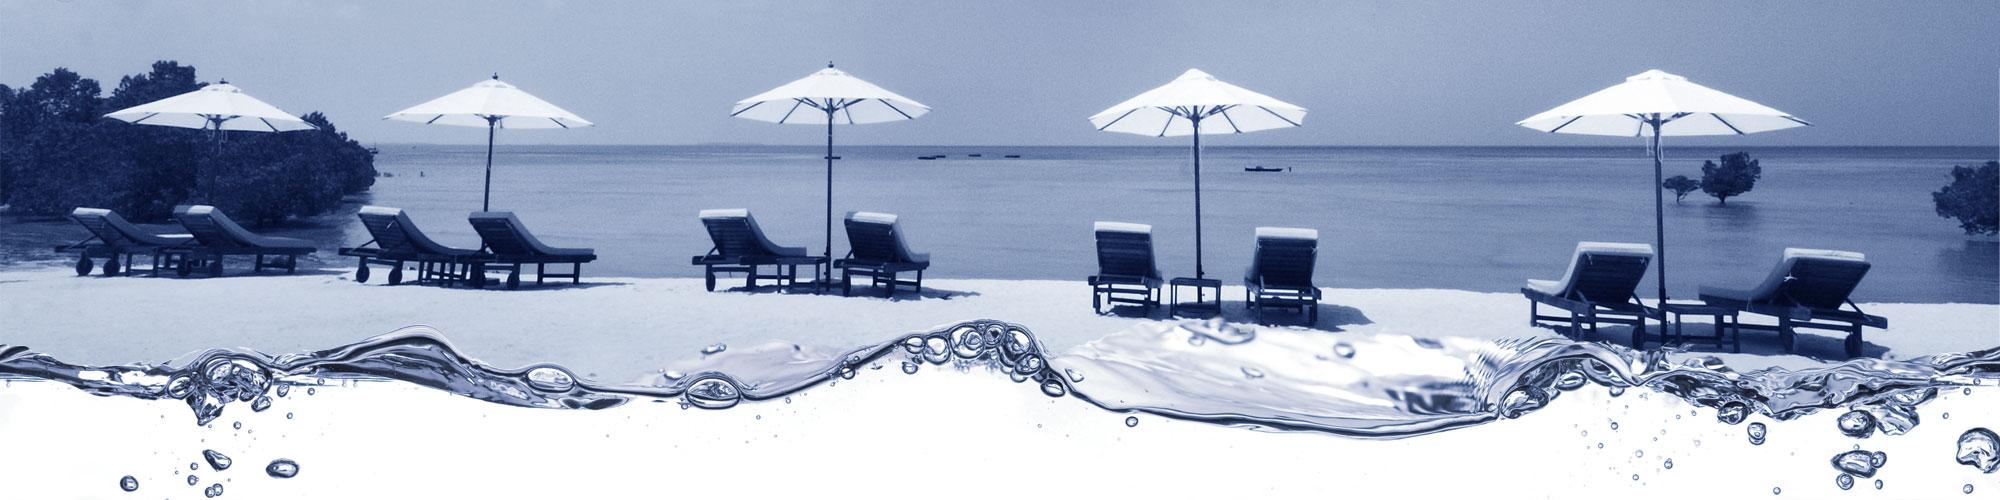 Africa-tanzania-sea-cliff-hotel-catering-laundry-dar-es-salaam